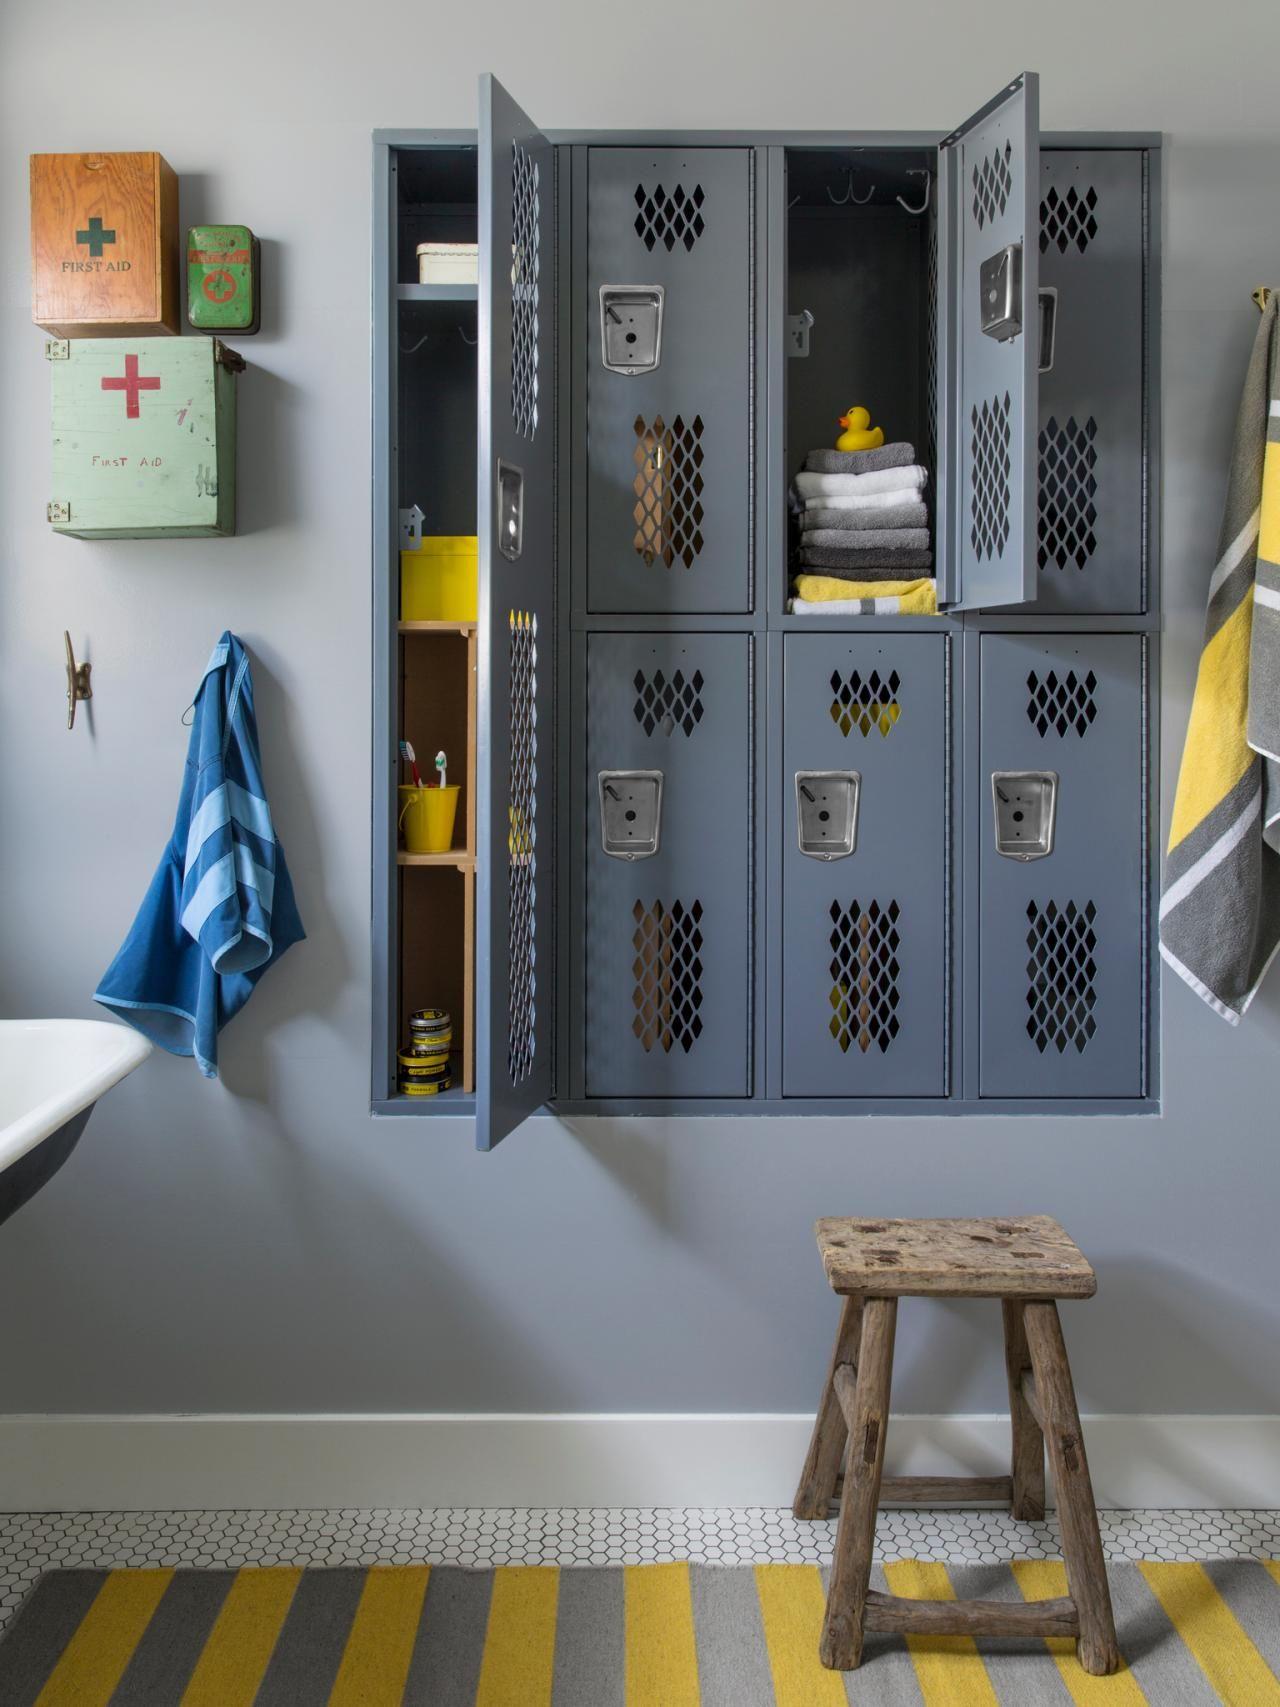 Cool Concepts Home Dream Bathrooms